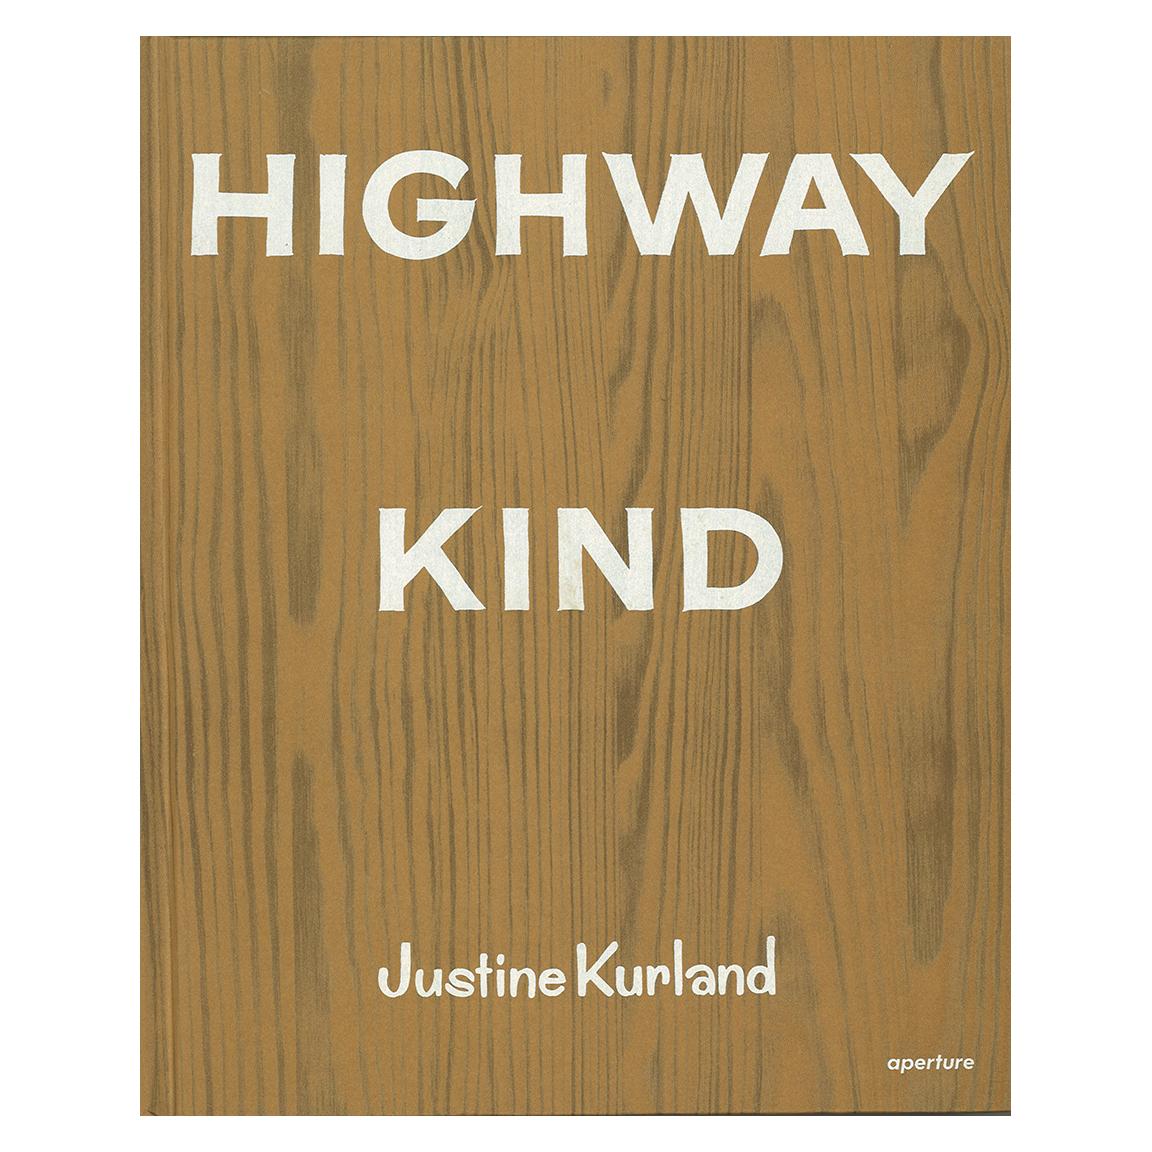 Justine Kurland - Highway Kind